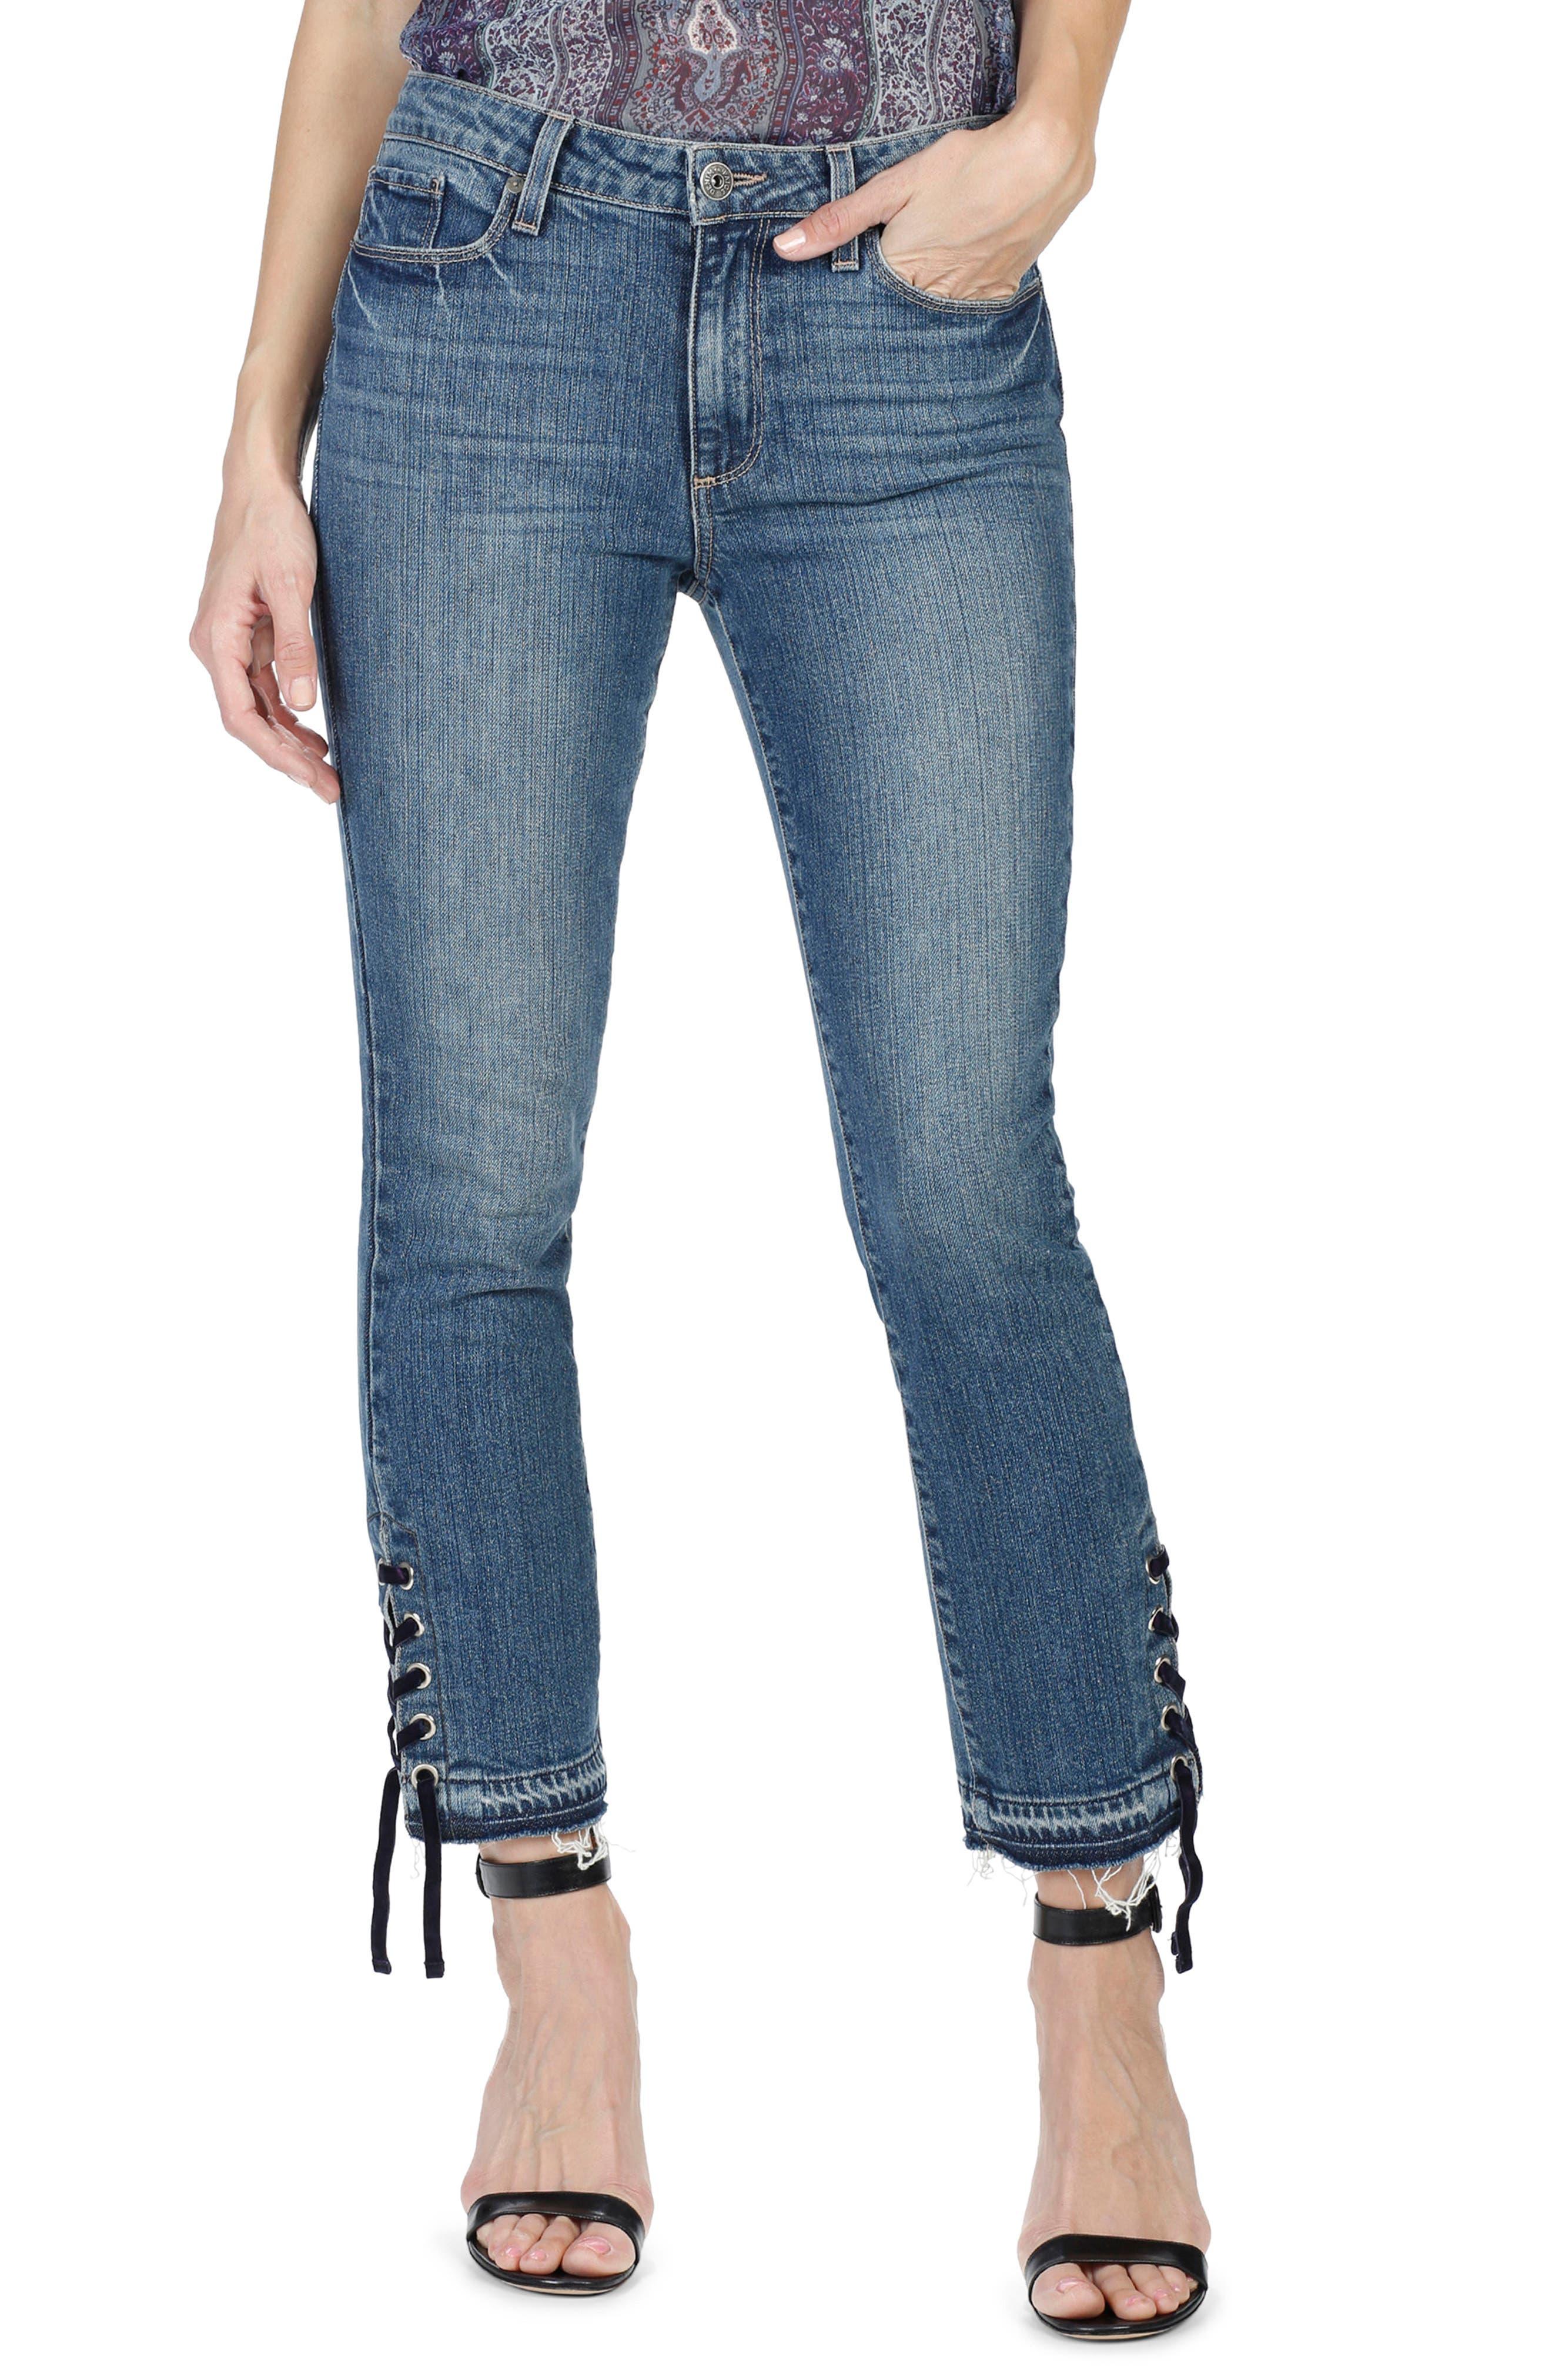 Main Image - PAIGE Jacqueline High Waist Straight Leg Jeans (Lacey Indigo)